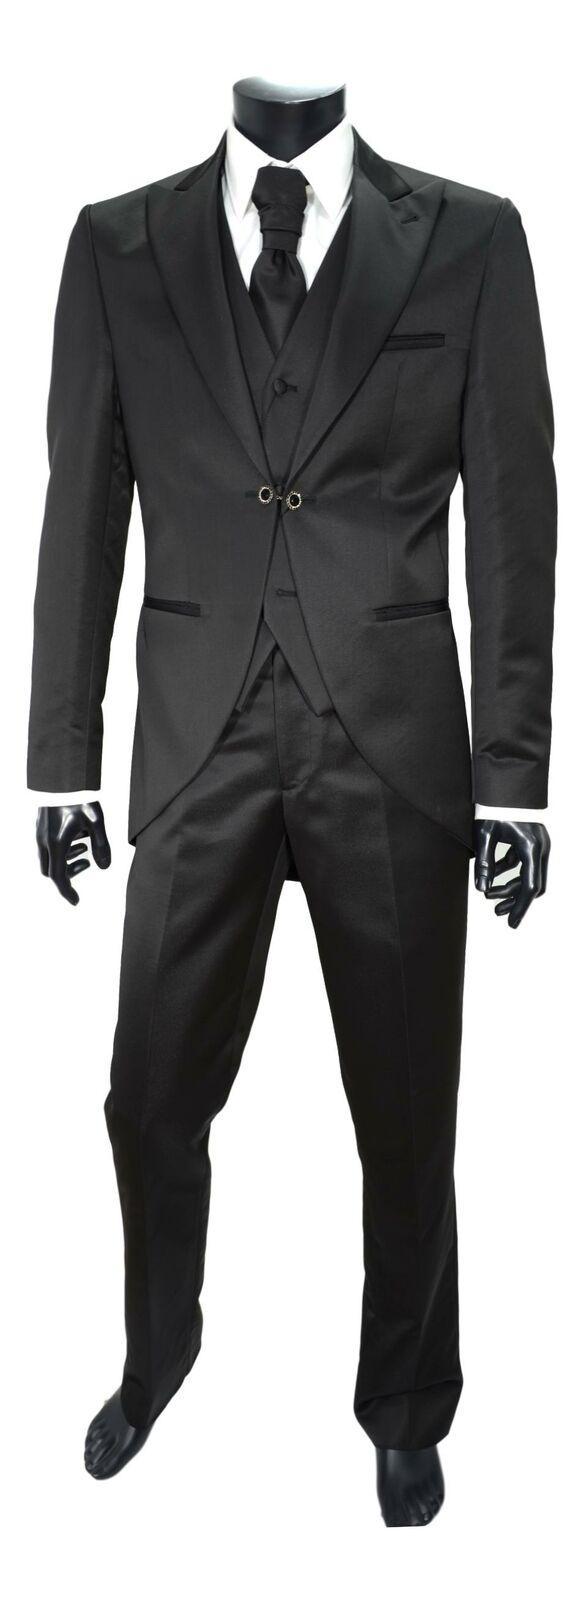 MAESTRAMI Suit Tight Ceremony Man Set 4 Pieces Black Blades' Size 48 Slim